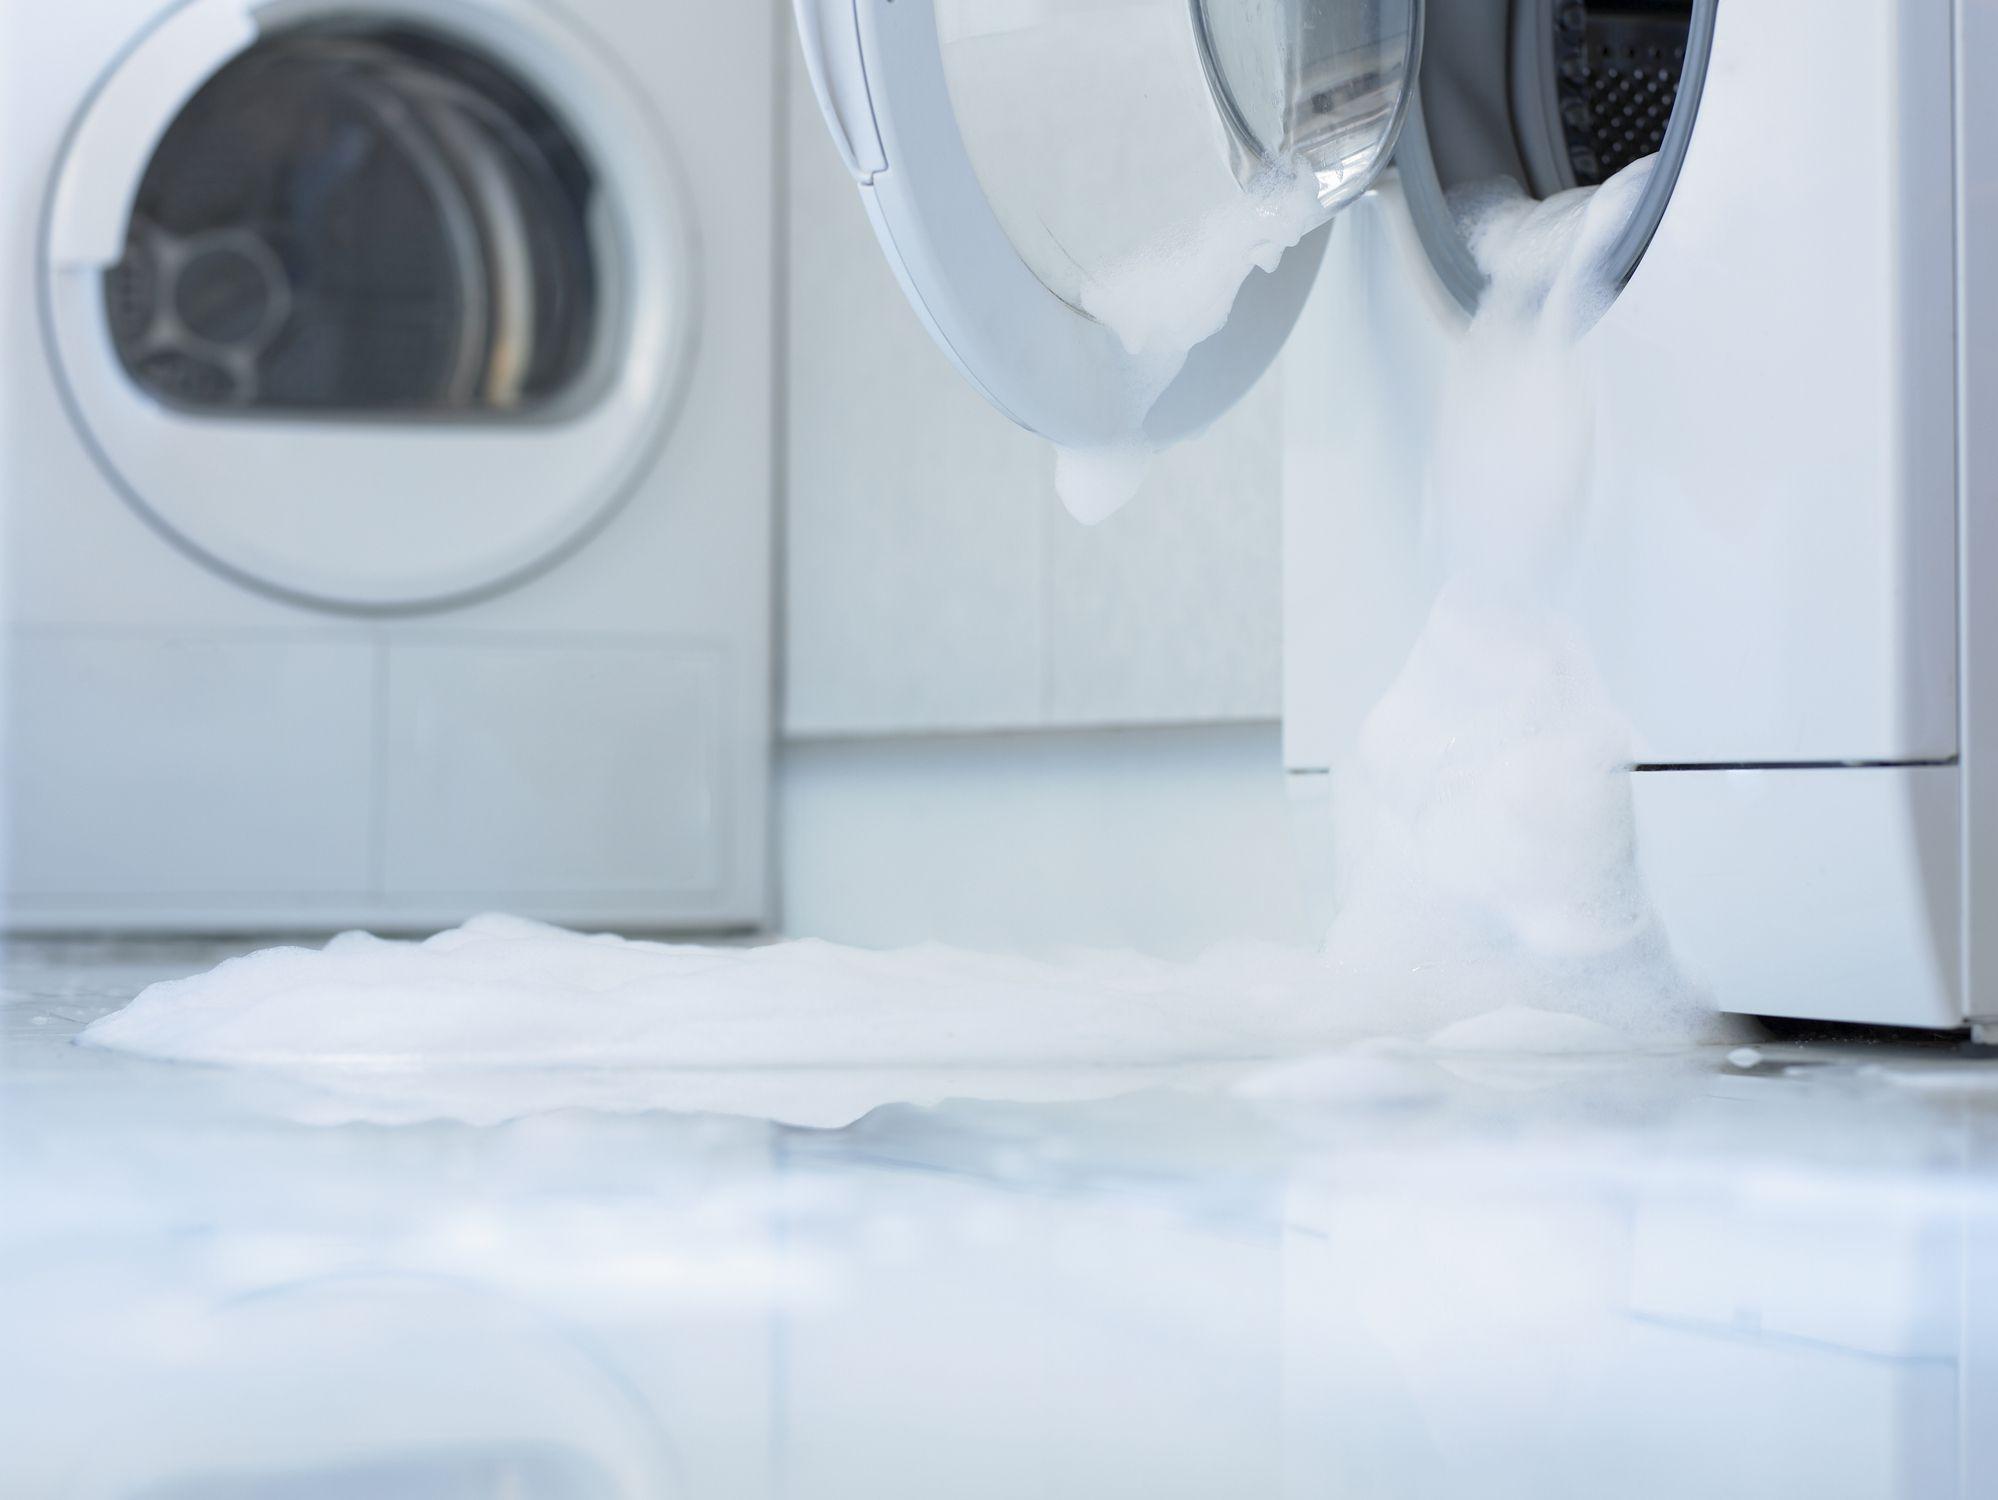 a washing machine overflowing